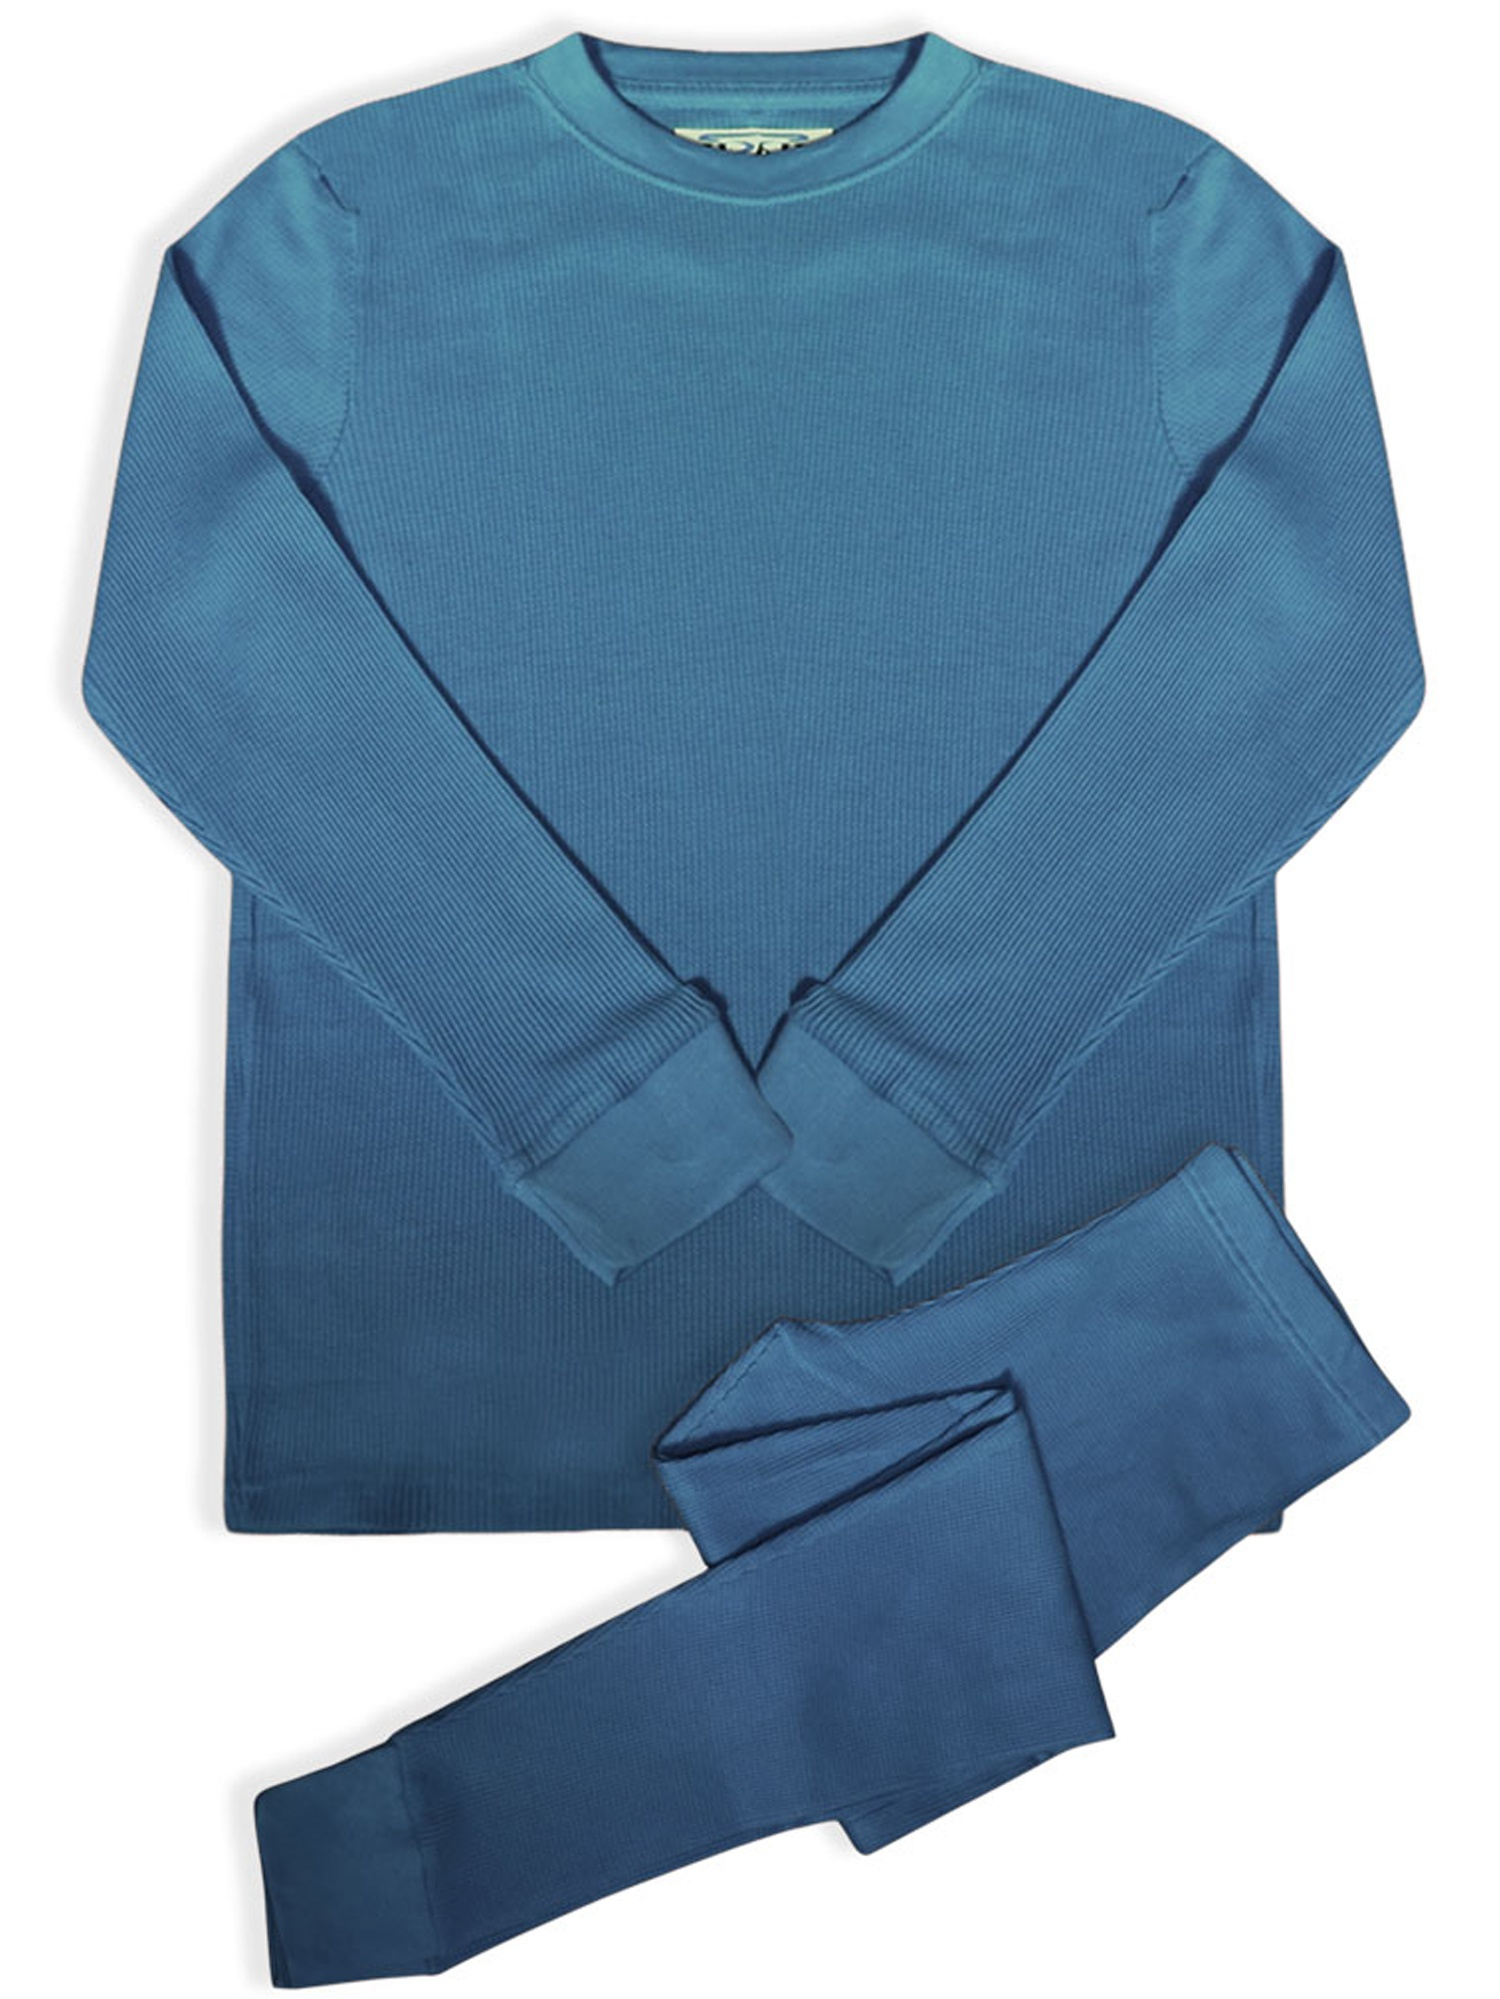 BASICO Women's 2pc Long John Thermal Underwear Set 100% Cotton(Single)